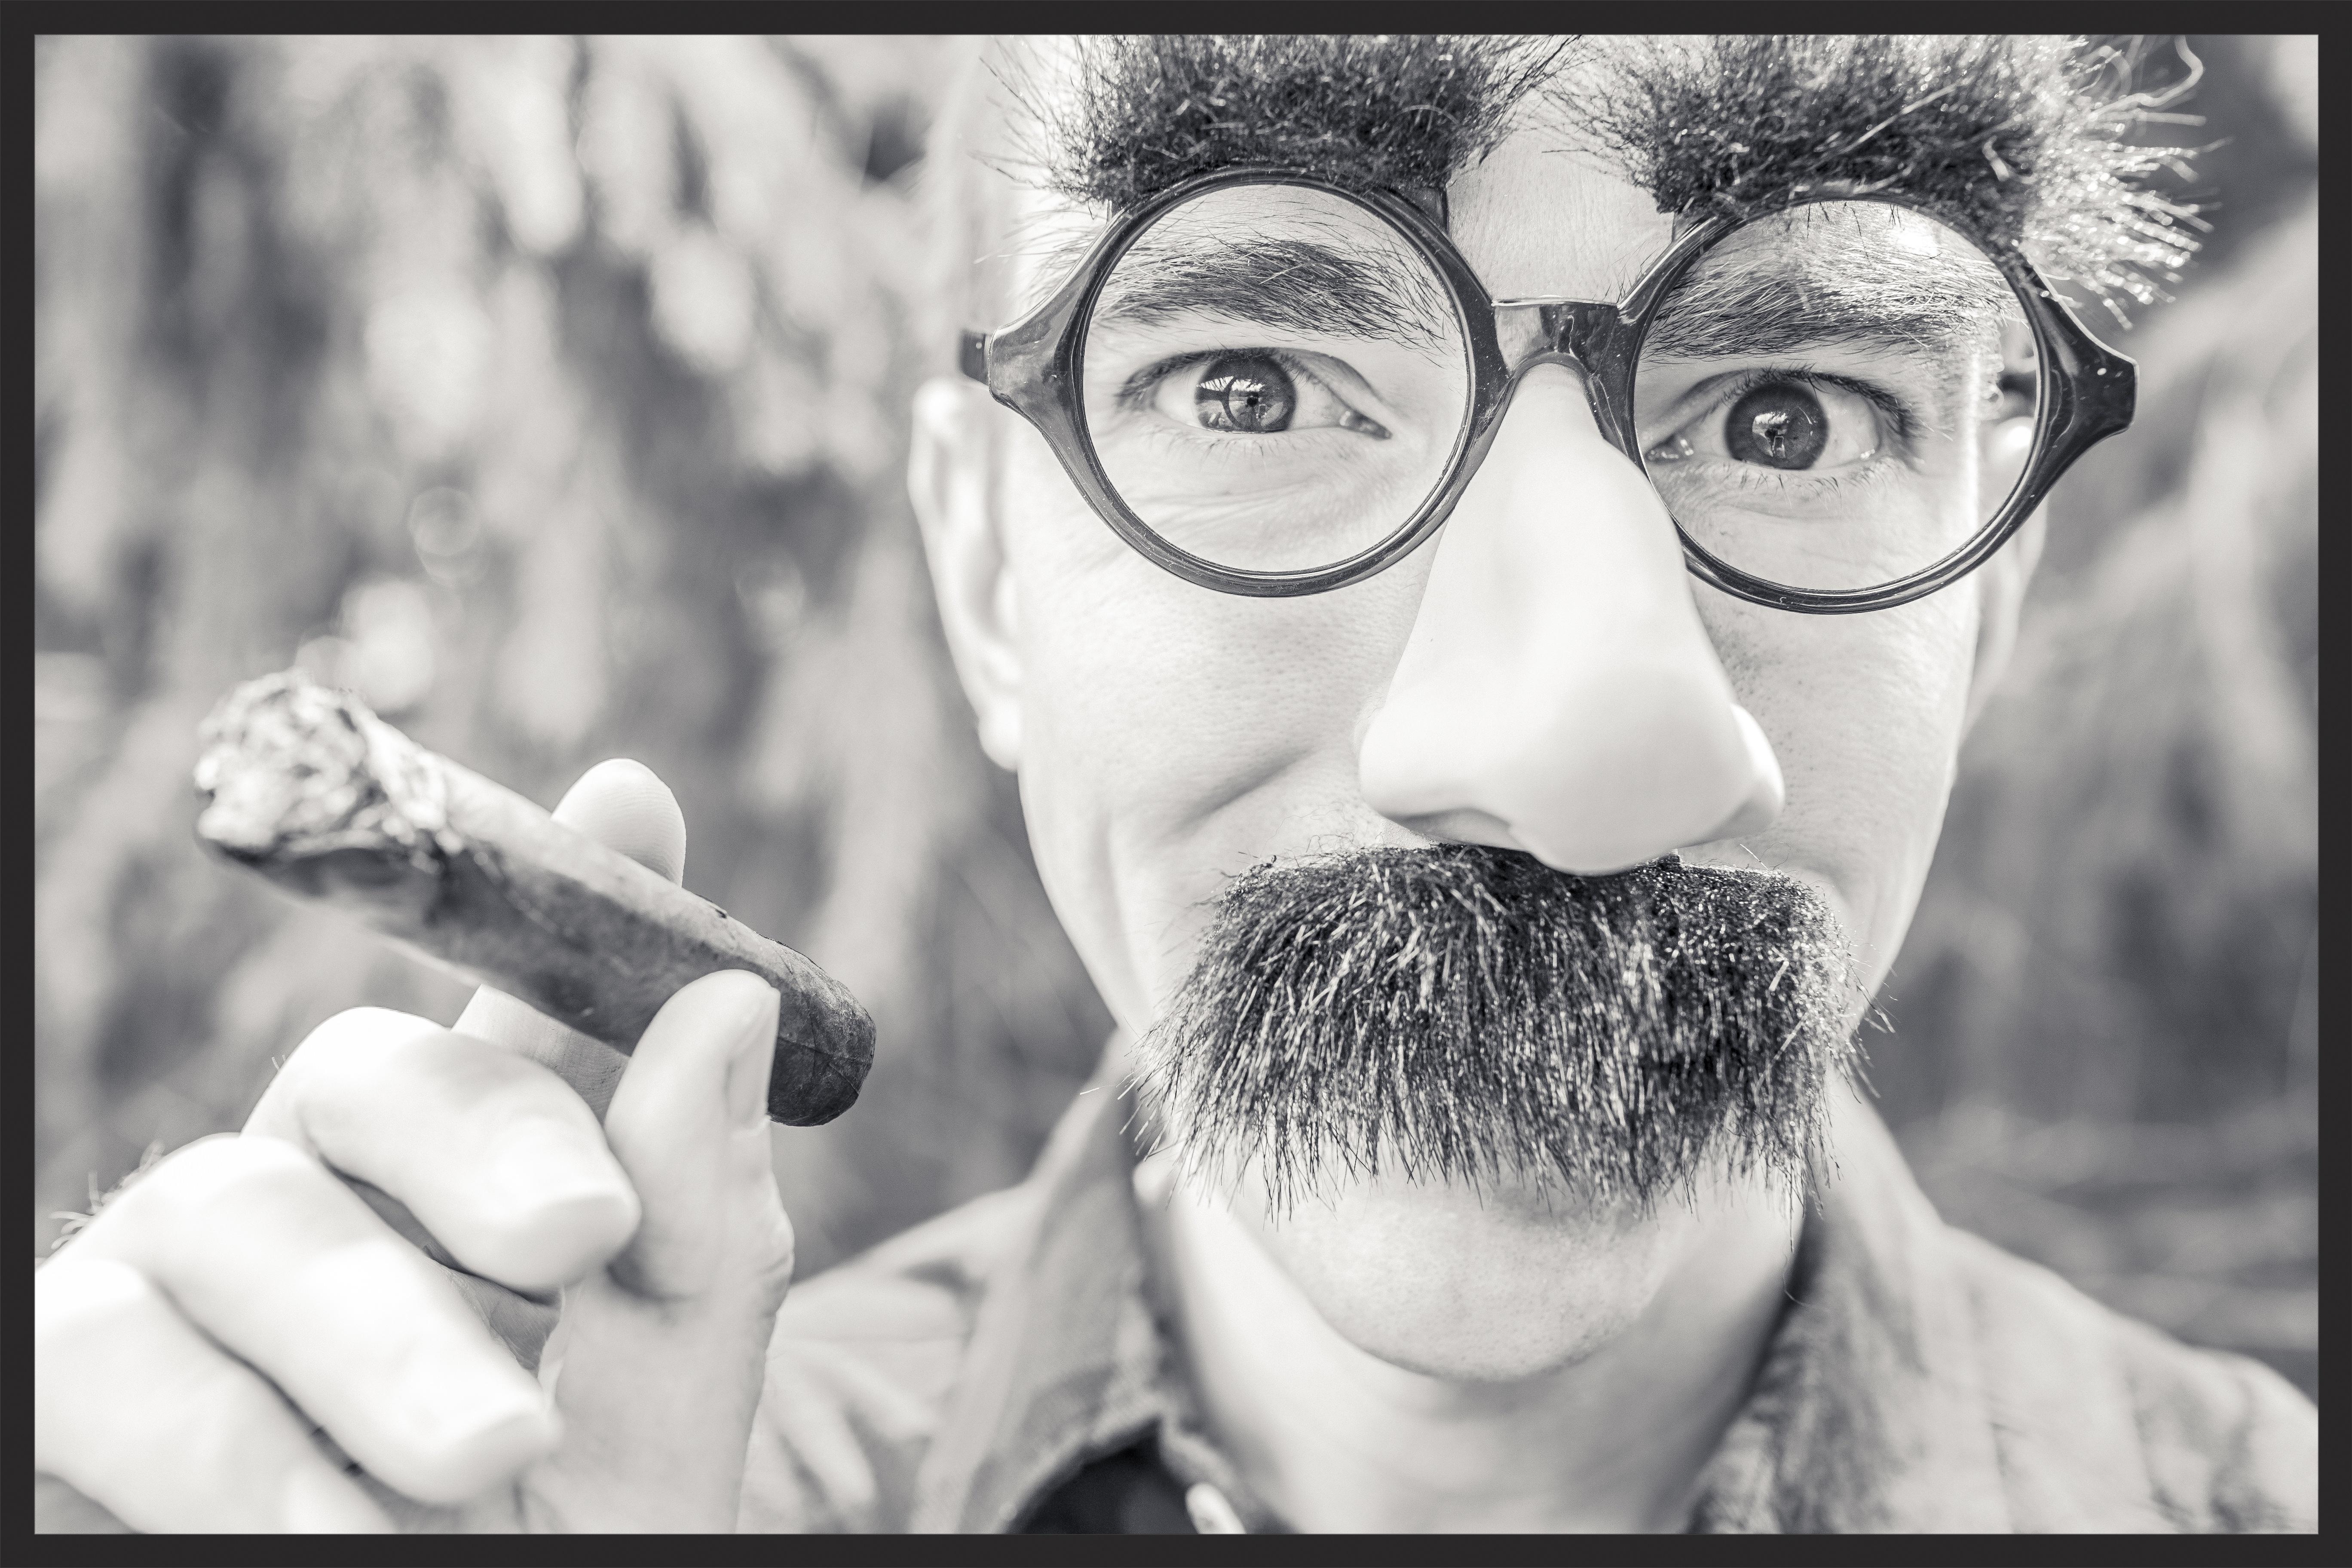 Man_in_Marx_Mustache-299722-edited.jpg